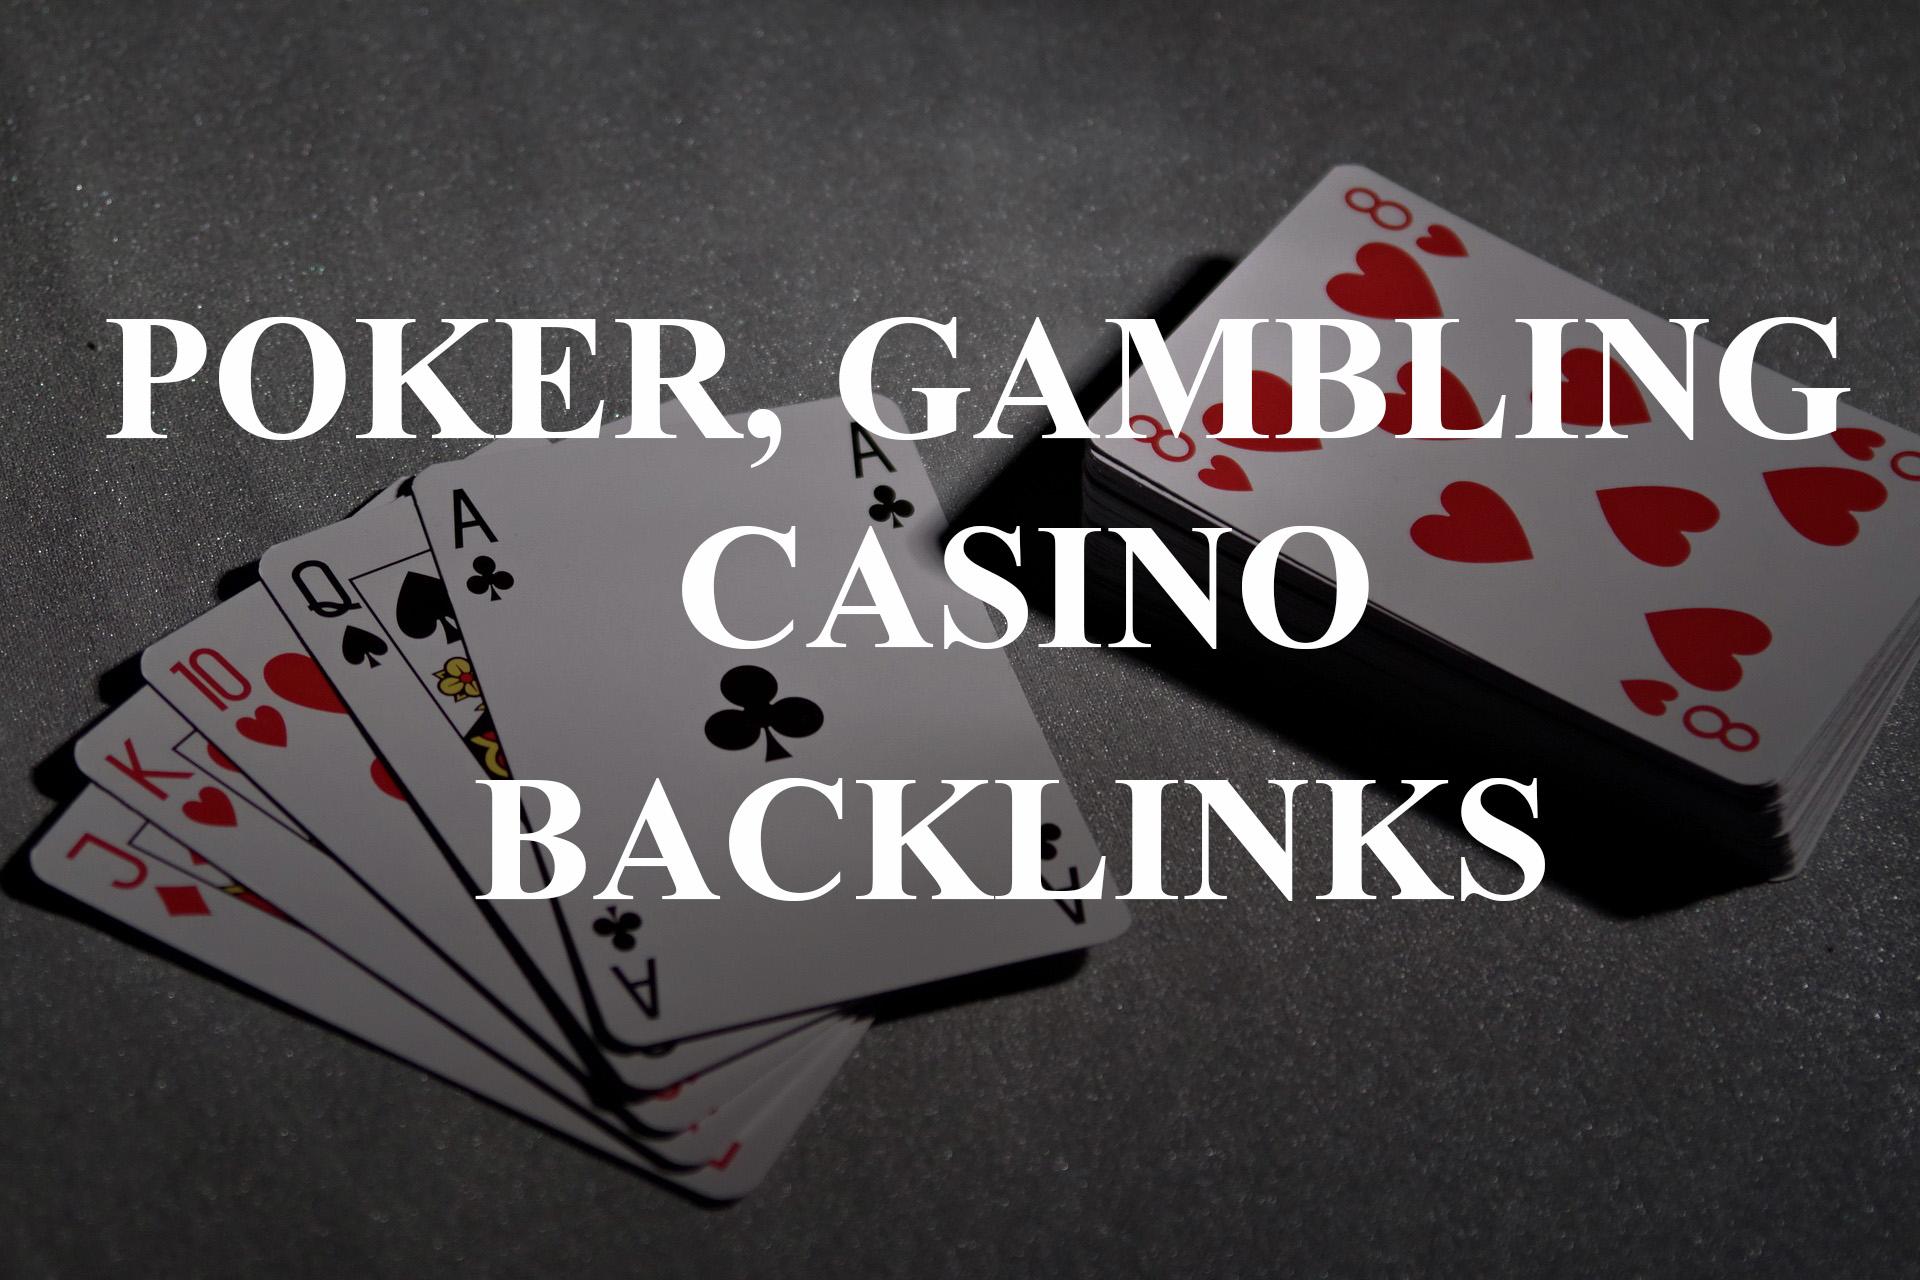 2850 poker,  casino and gambling pbns backlinks